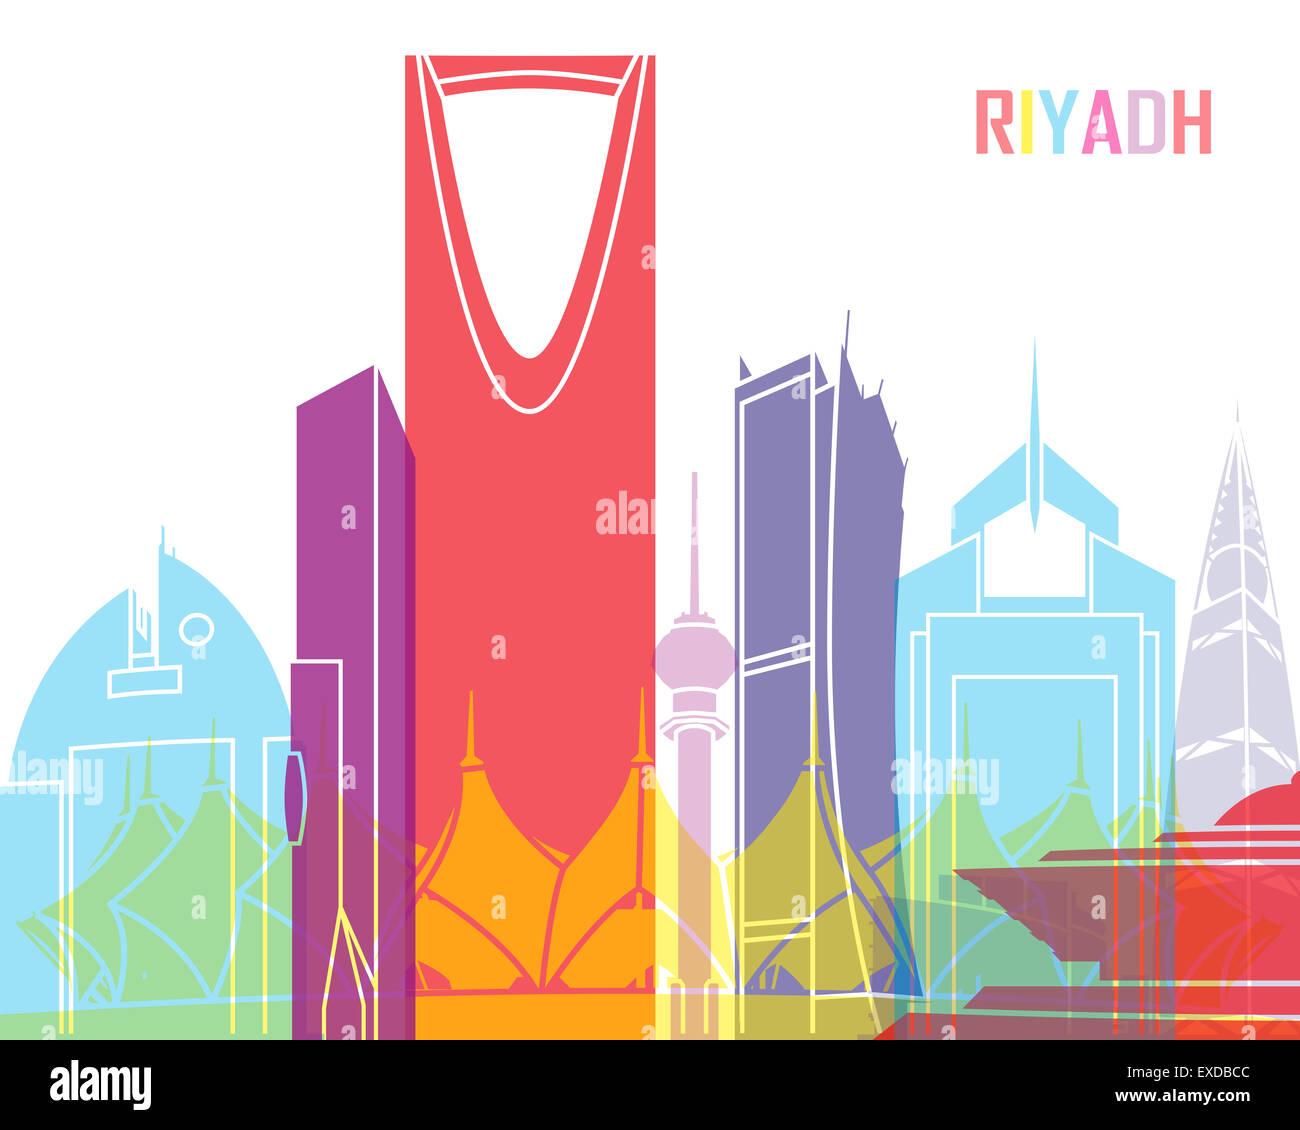 Riyadh skyline pop en fichier vectoriel éditable Photo Stock